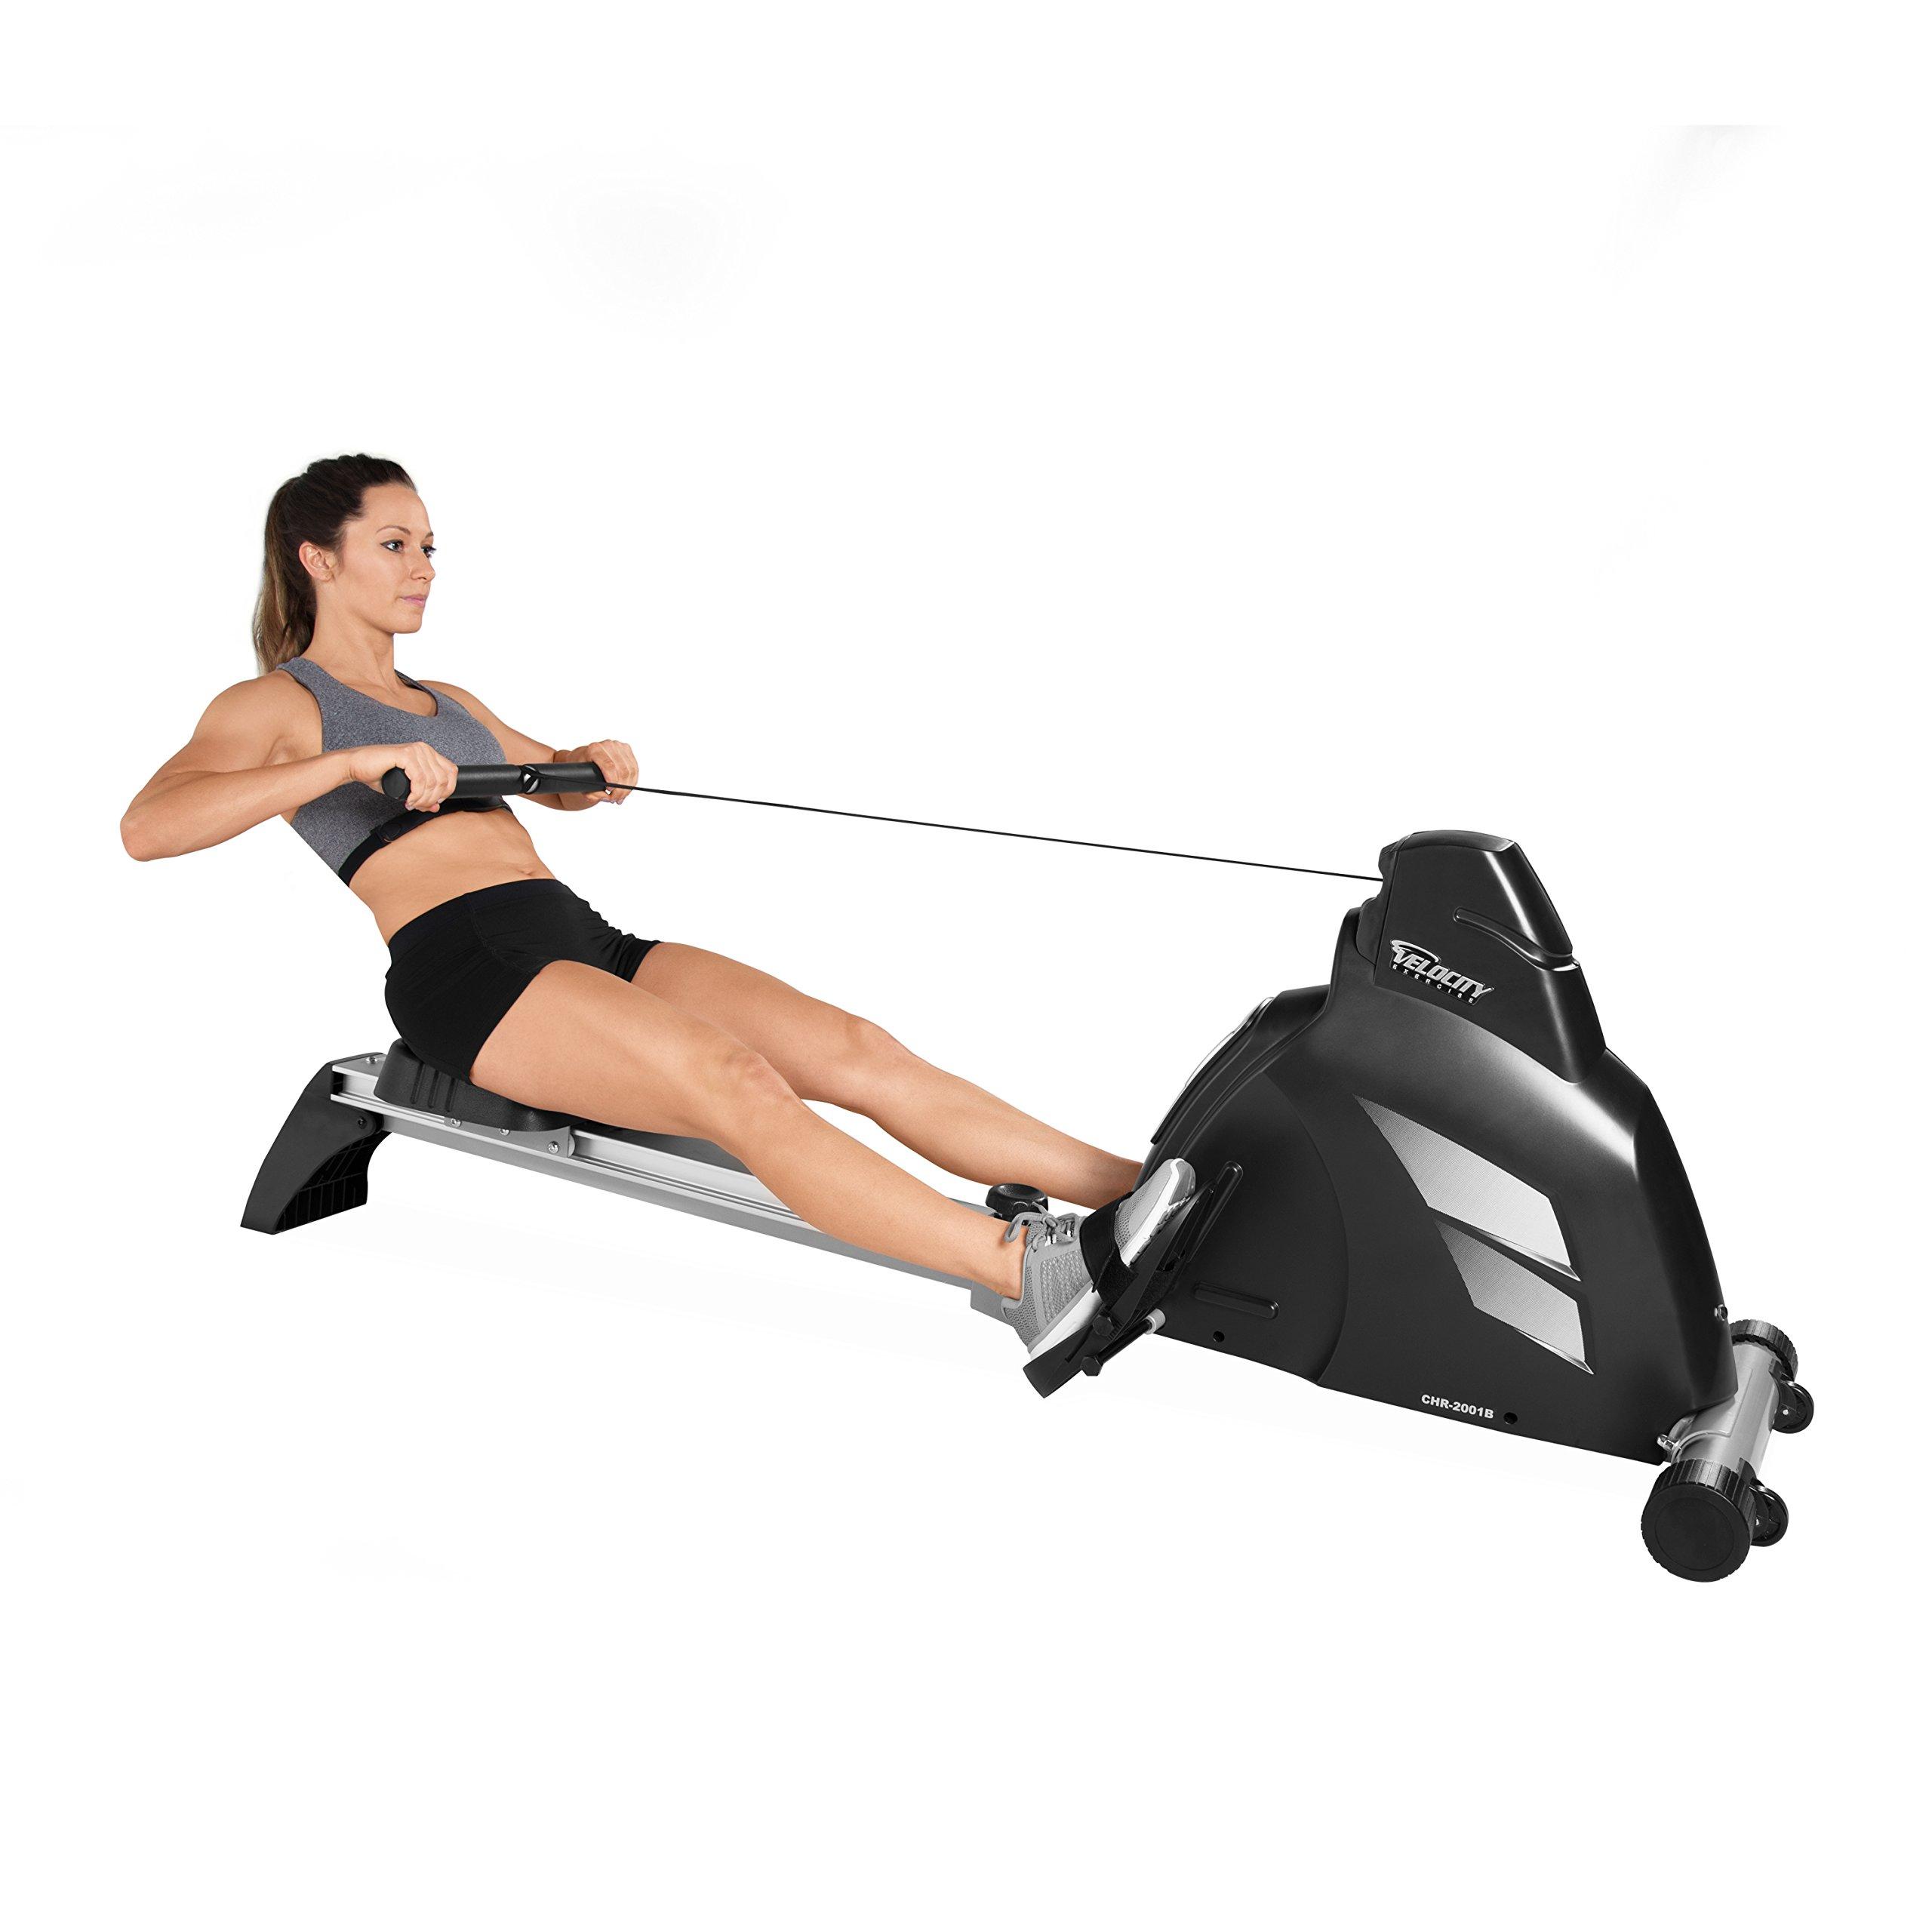 Velocity Exercise Magnetic Rower, Black by velocityexercise (Image #4)